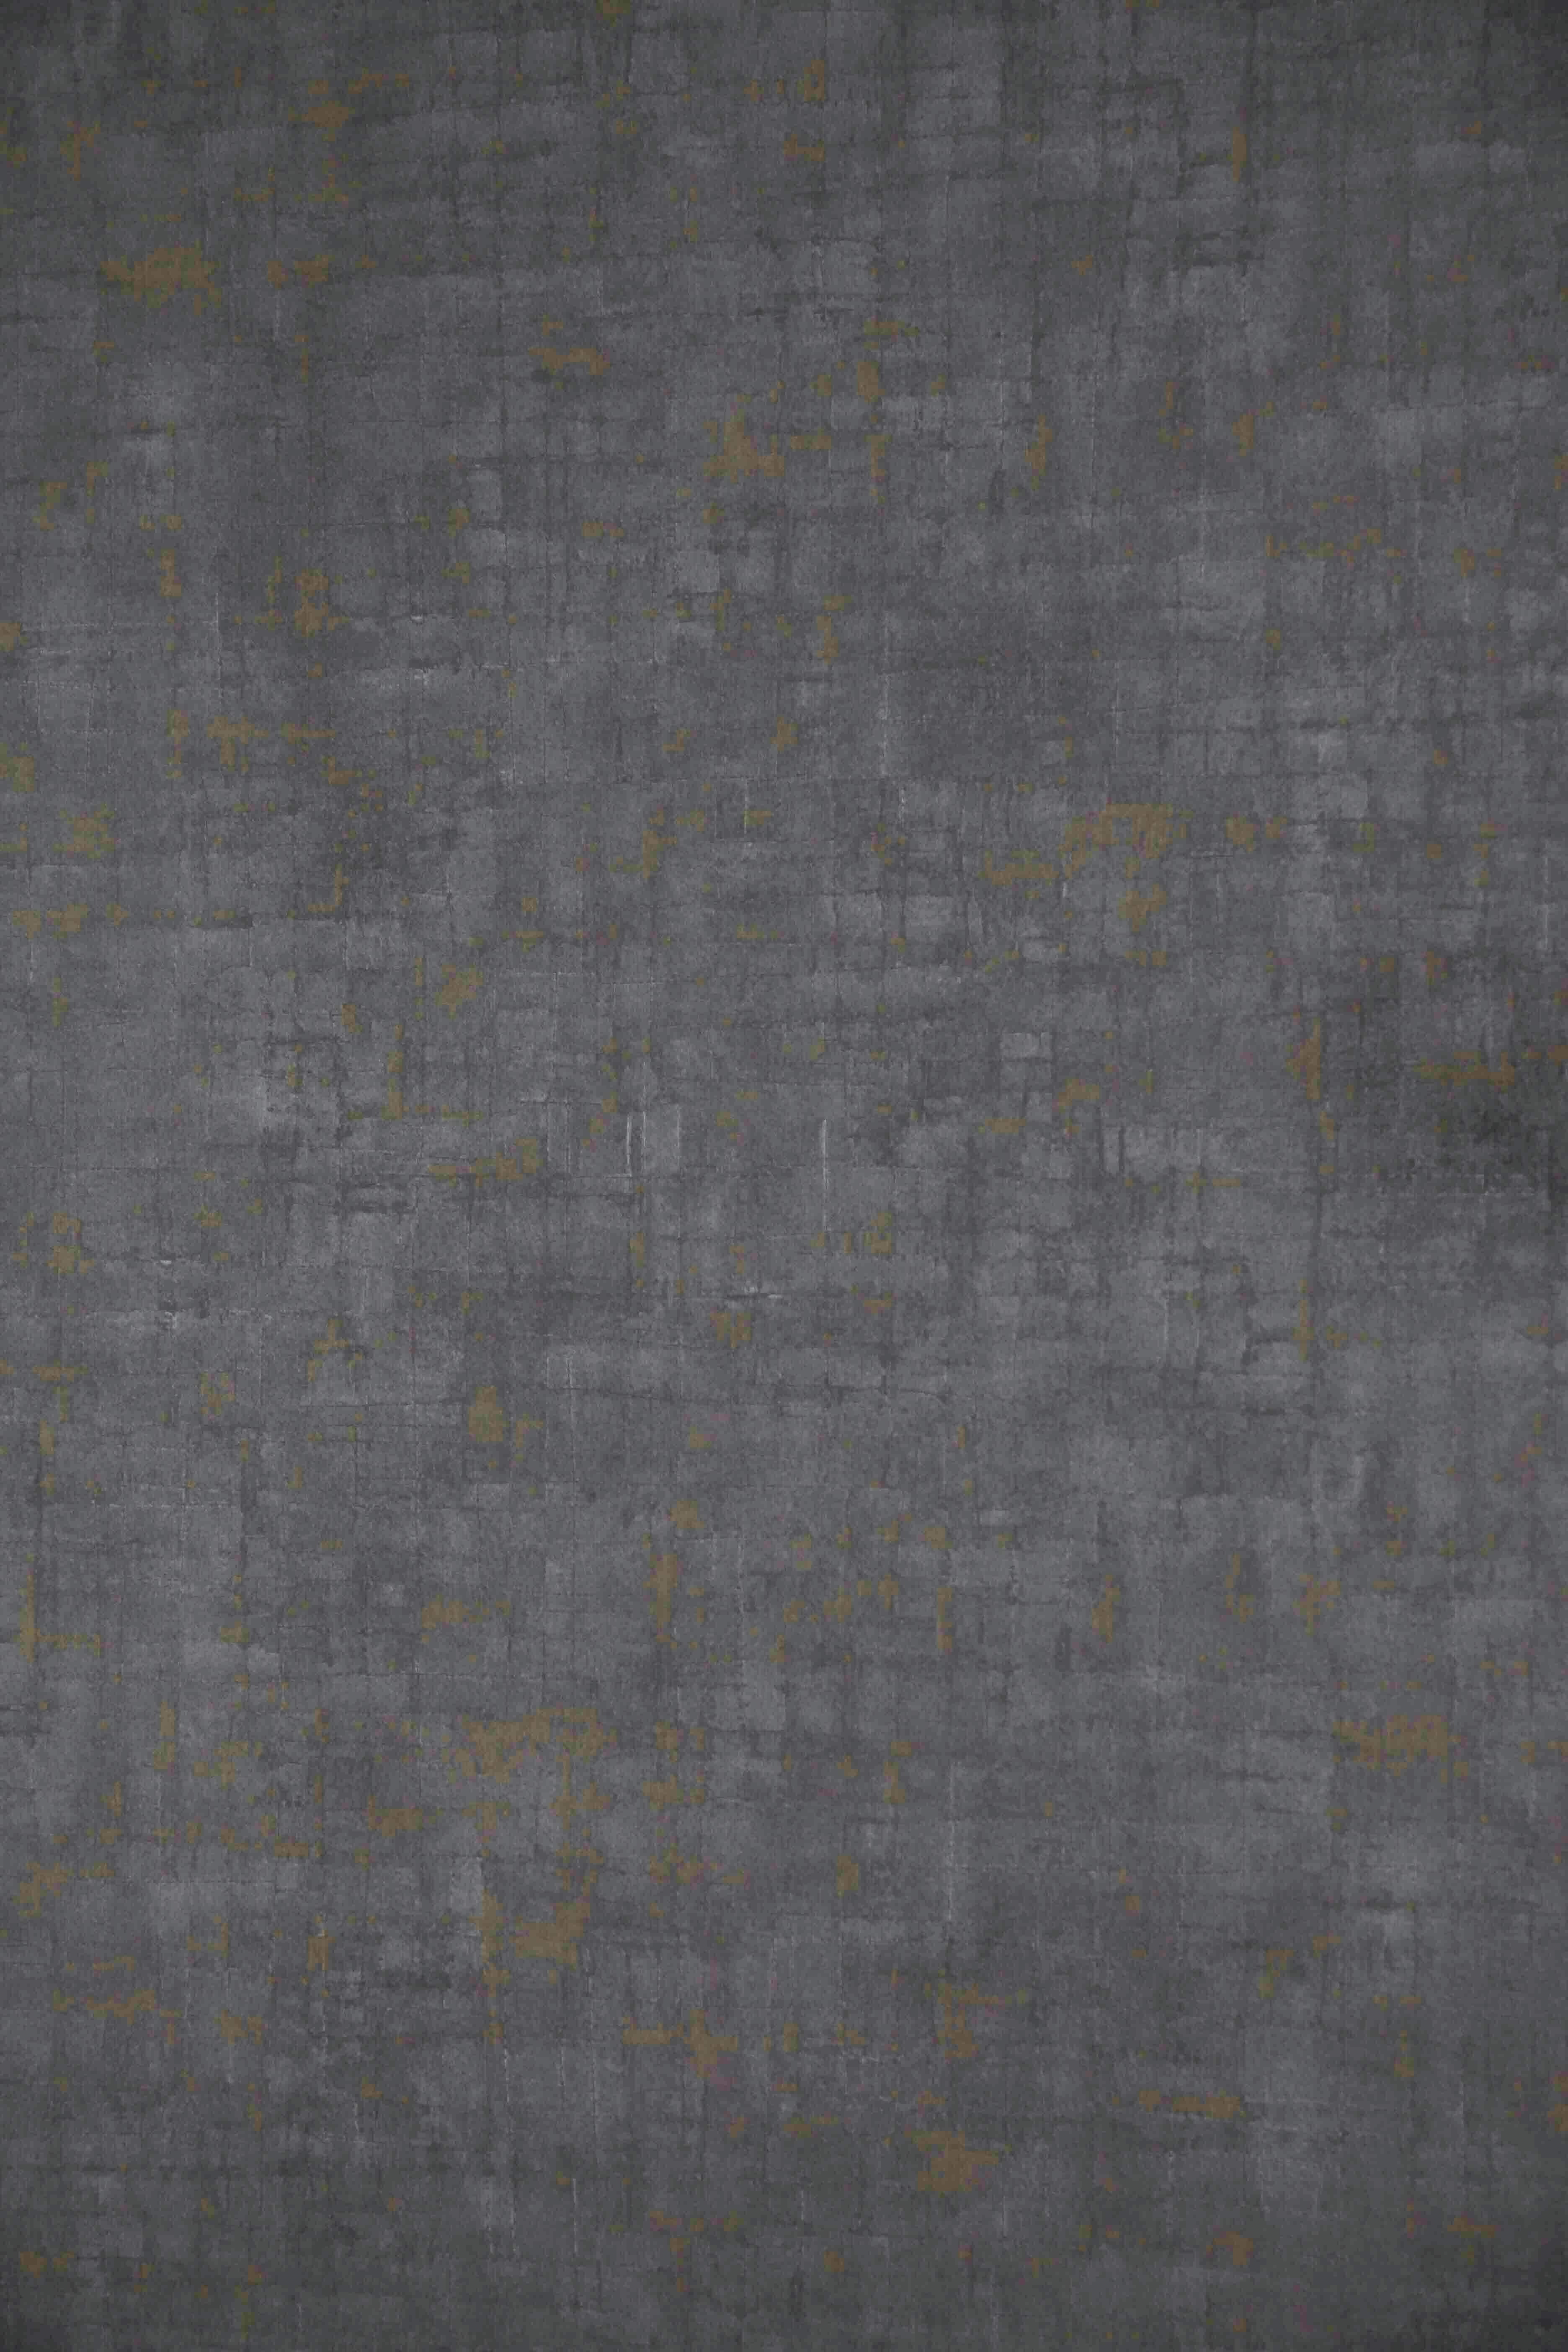 BAL 3315 W - Bruges Stone raw cement stone grey urban